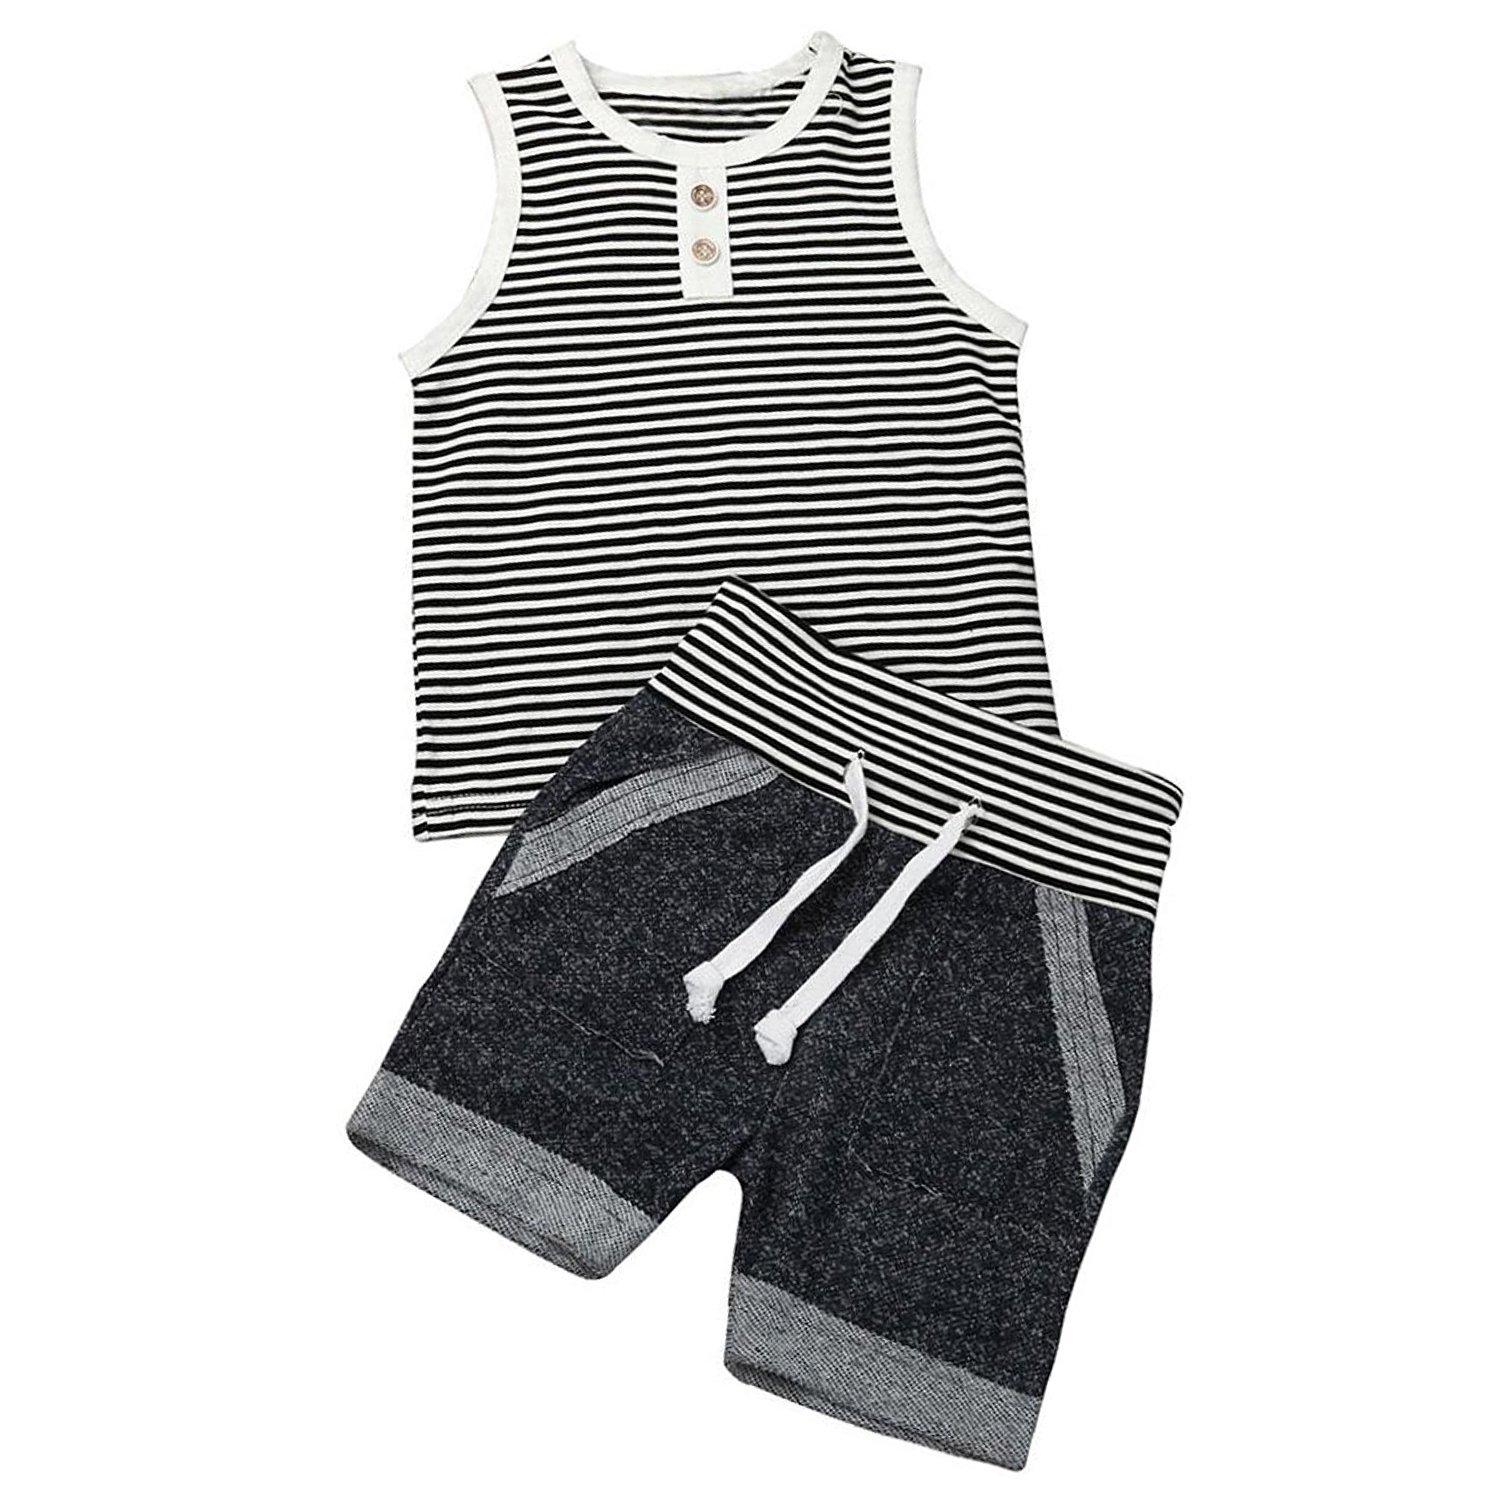 INHoney Baby Boy Girl Sleeveless Stripe T-Shirt Vest + Rope Shorts (0-6 Months, Gray and White)